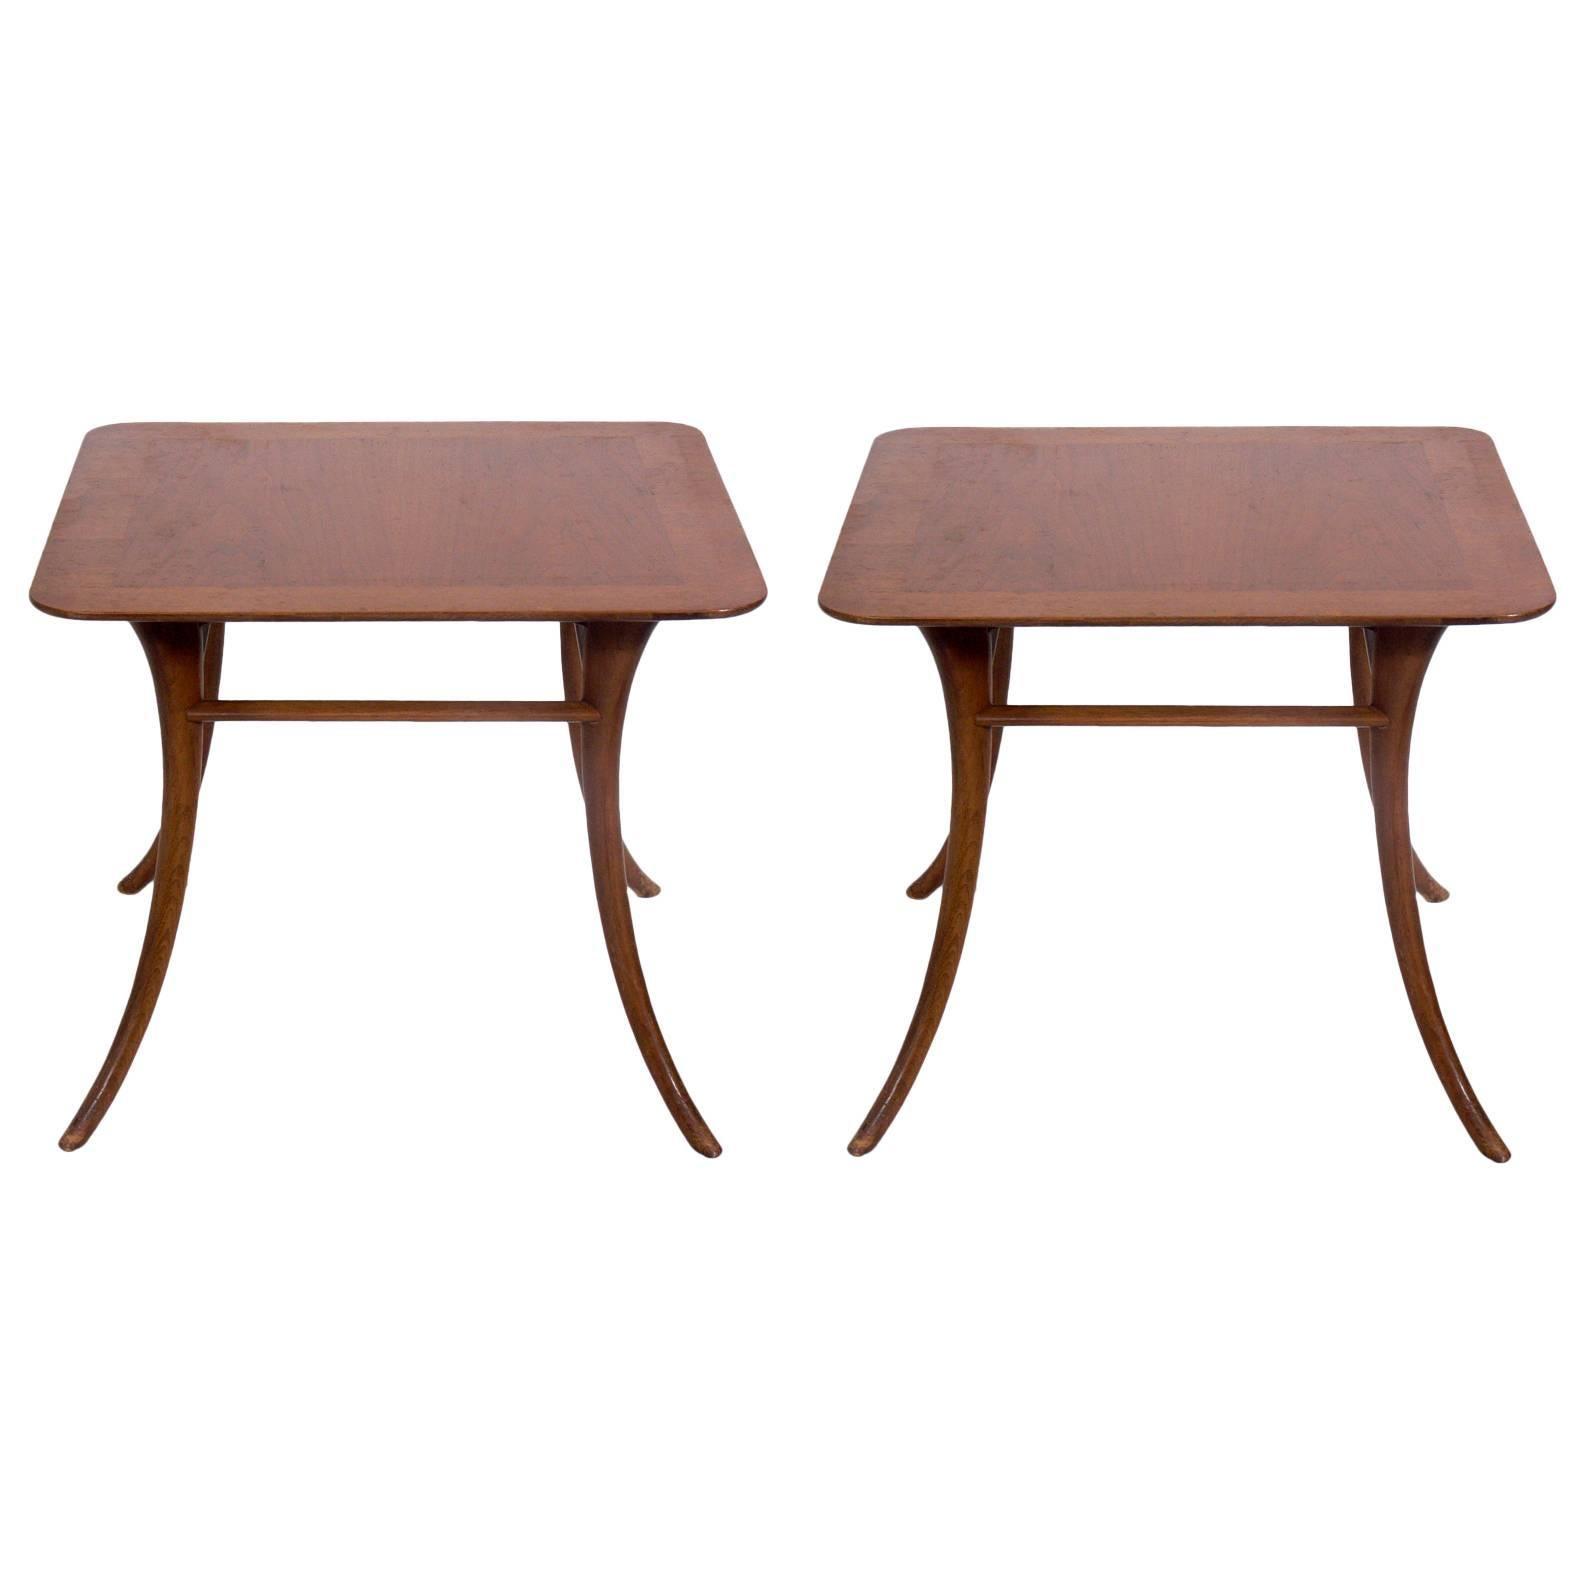 Pair of Klismos Leg Side Tables by T.H. Robsjohn-Gibbings